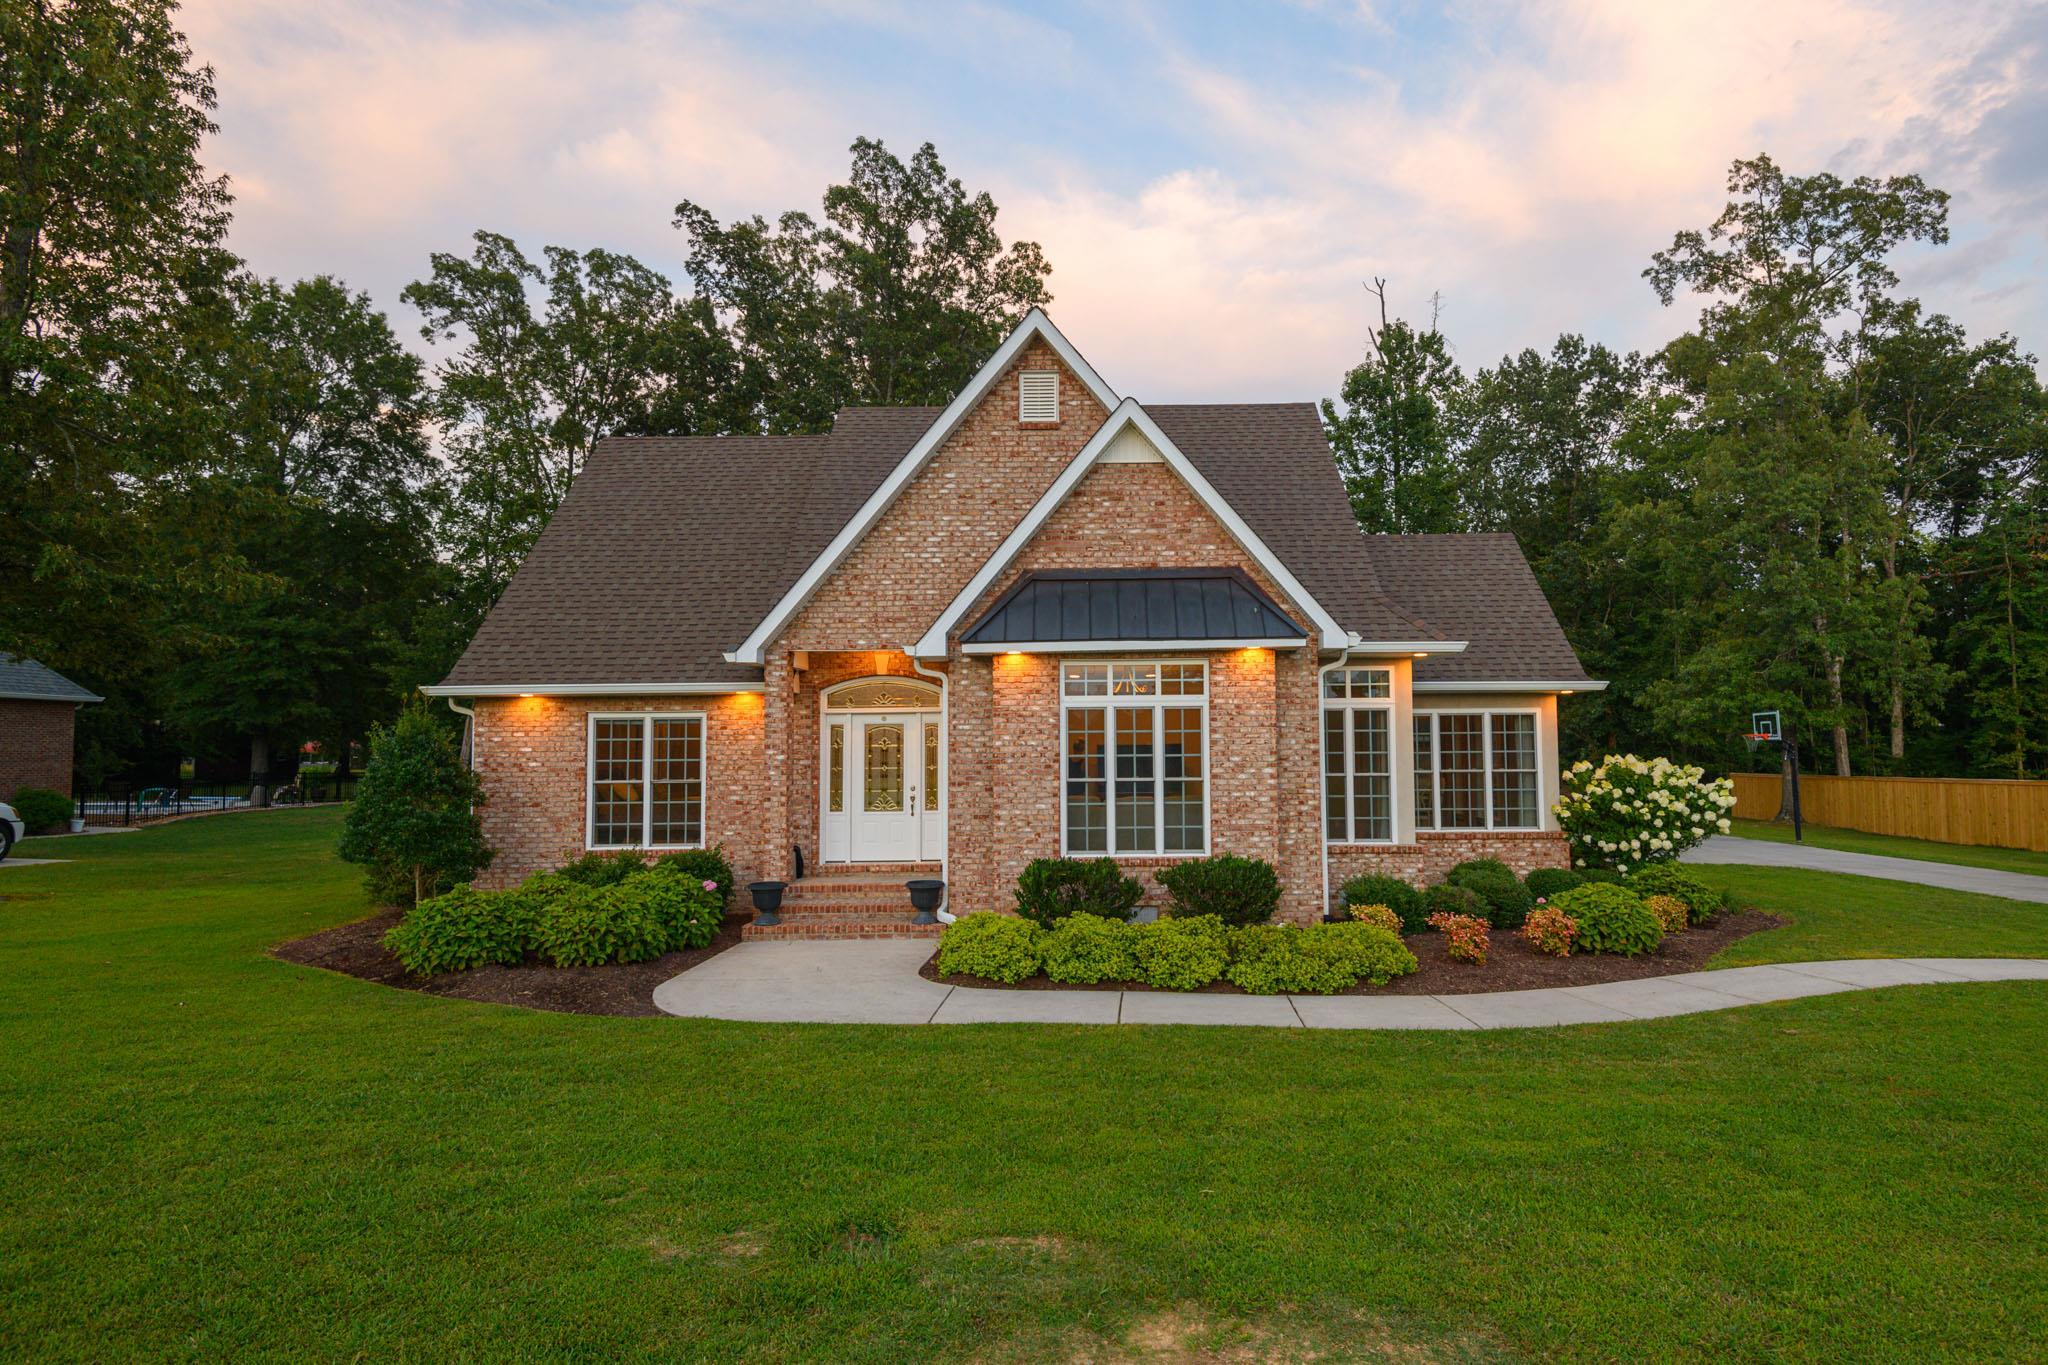 103 WOODSON DRIVE , Tullahoma, TN 37388 - Tullahoma, TN real estate listing